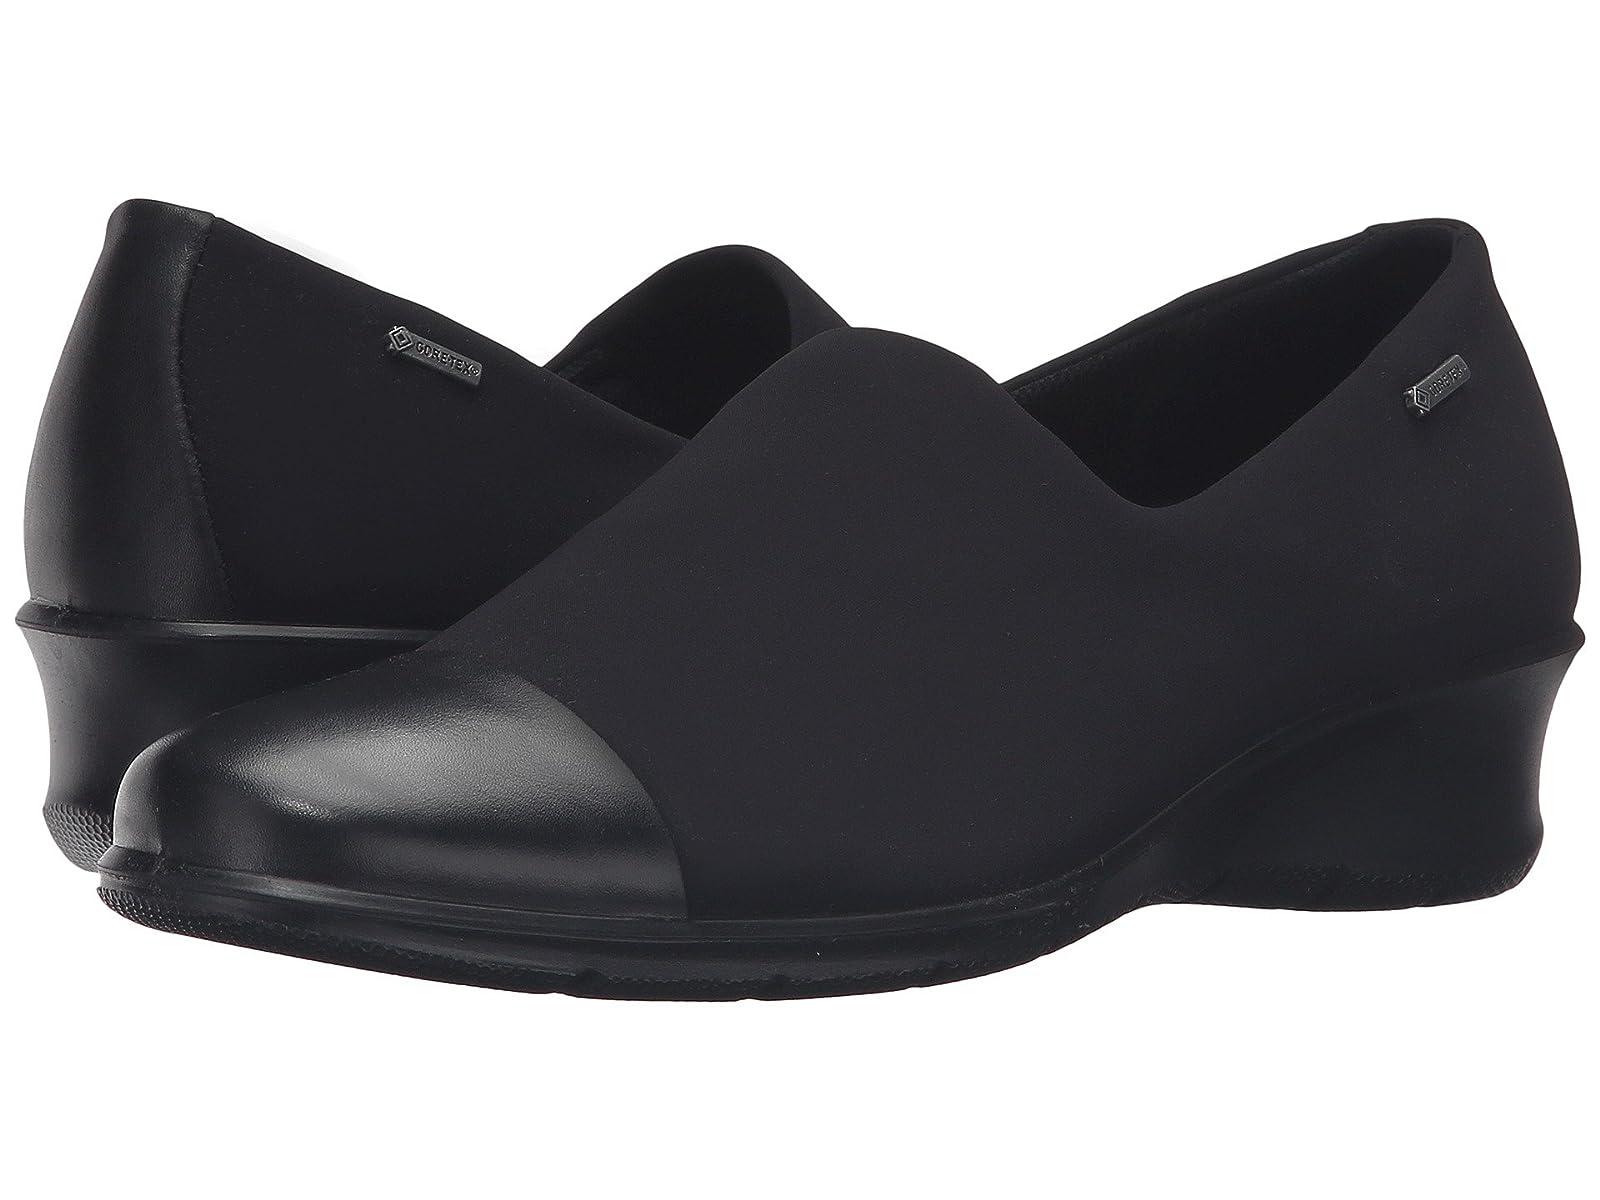 ECCO Felicia GTX Slip-OnAtmospheric grades have affordable shoes